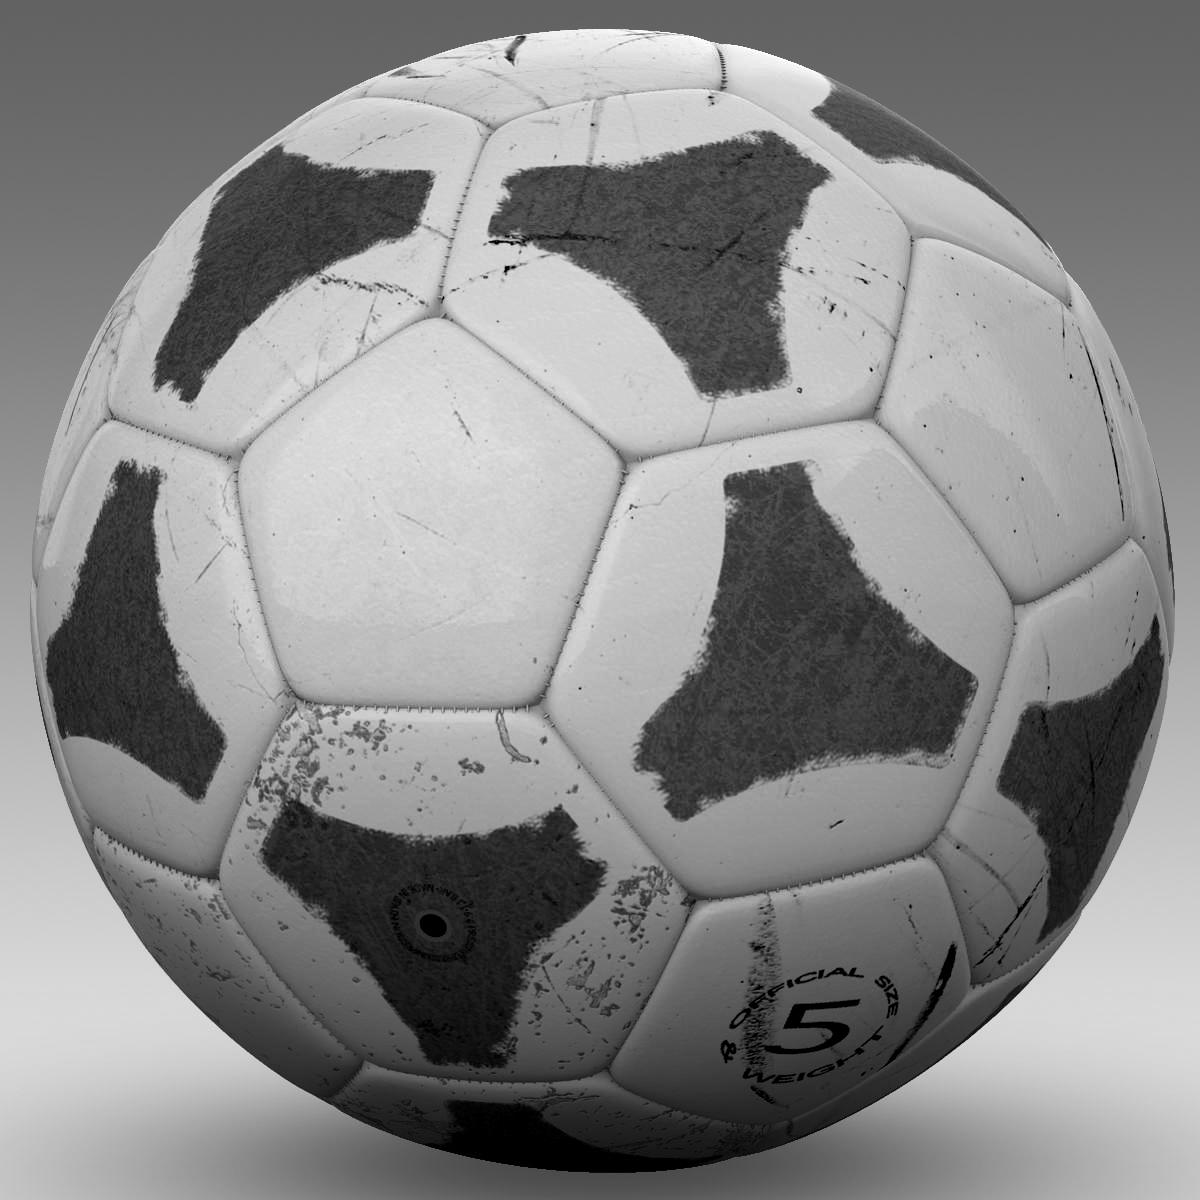 soccerball хар цагаан tri 3d загвар 3ds max fbx c4d ma mb obj 204053